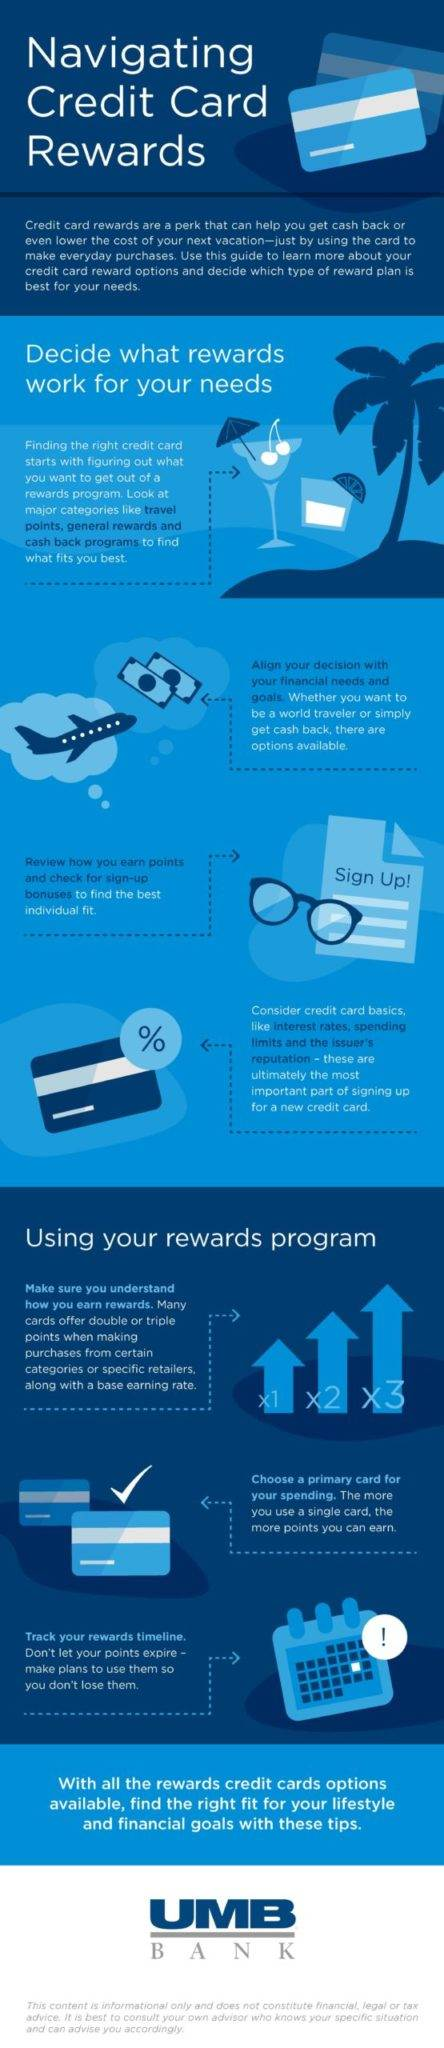 Navigating credit card rewards infographic image scaled 1